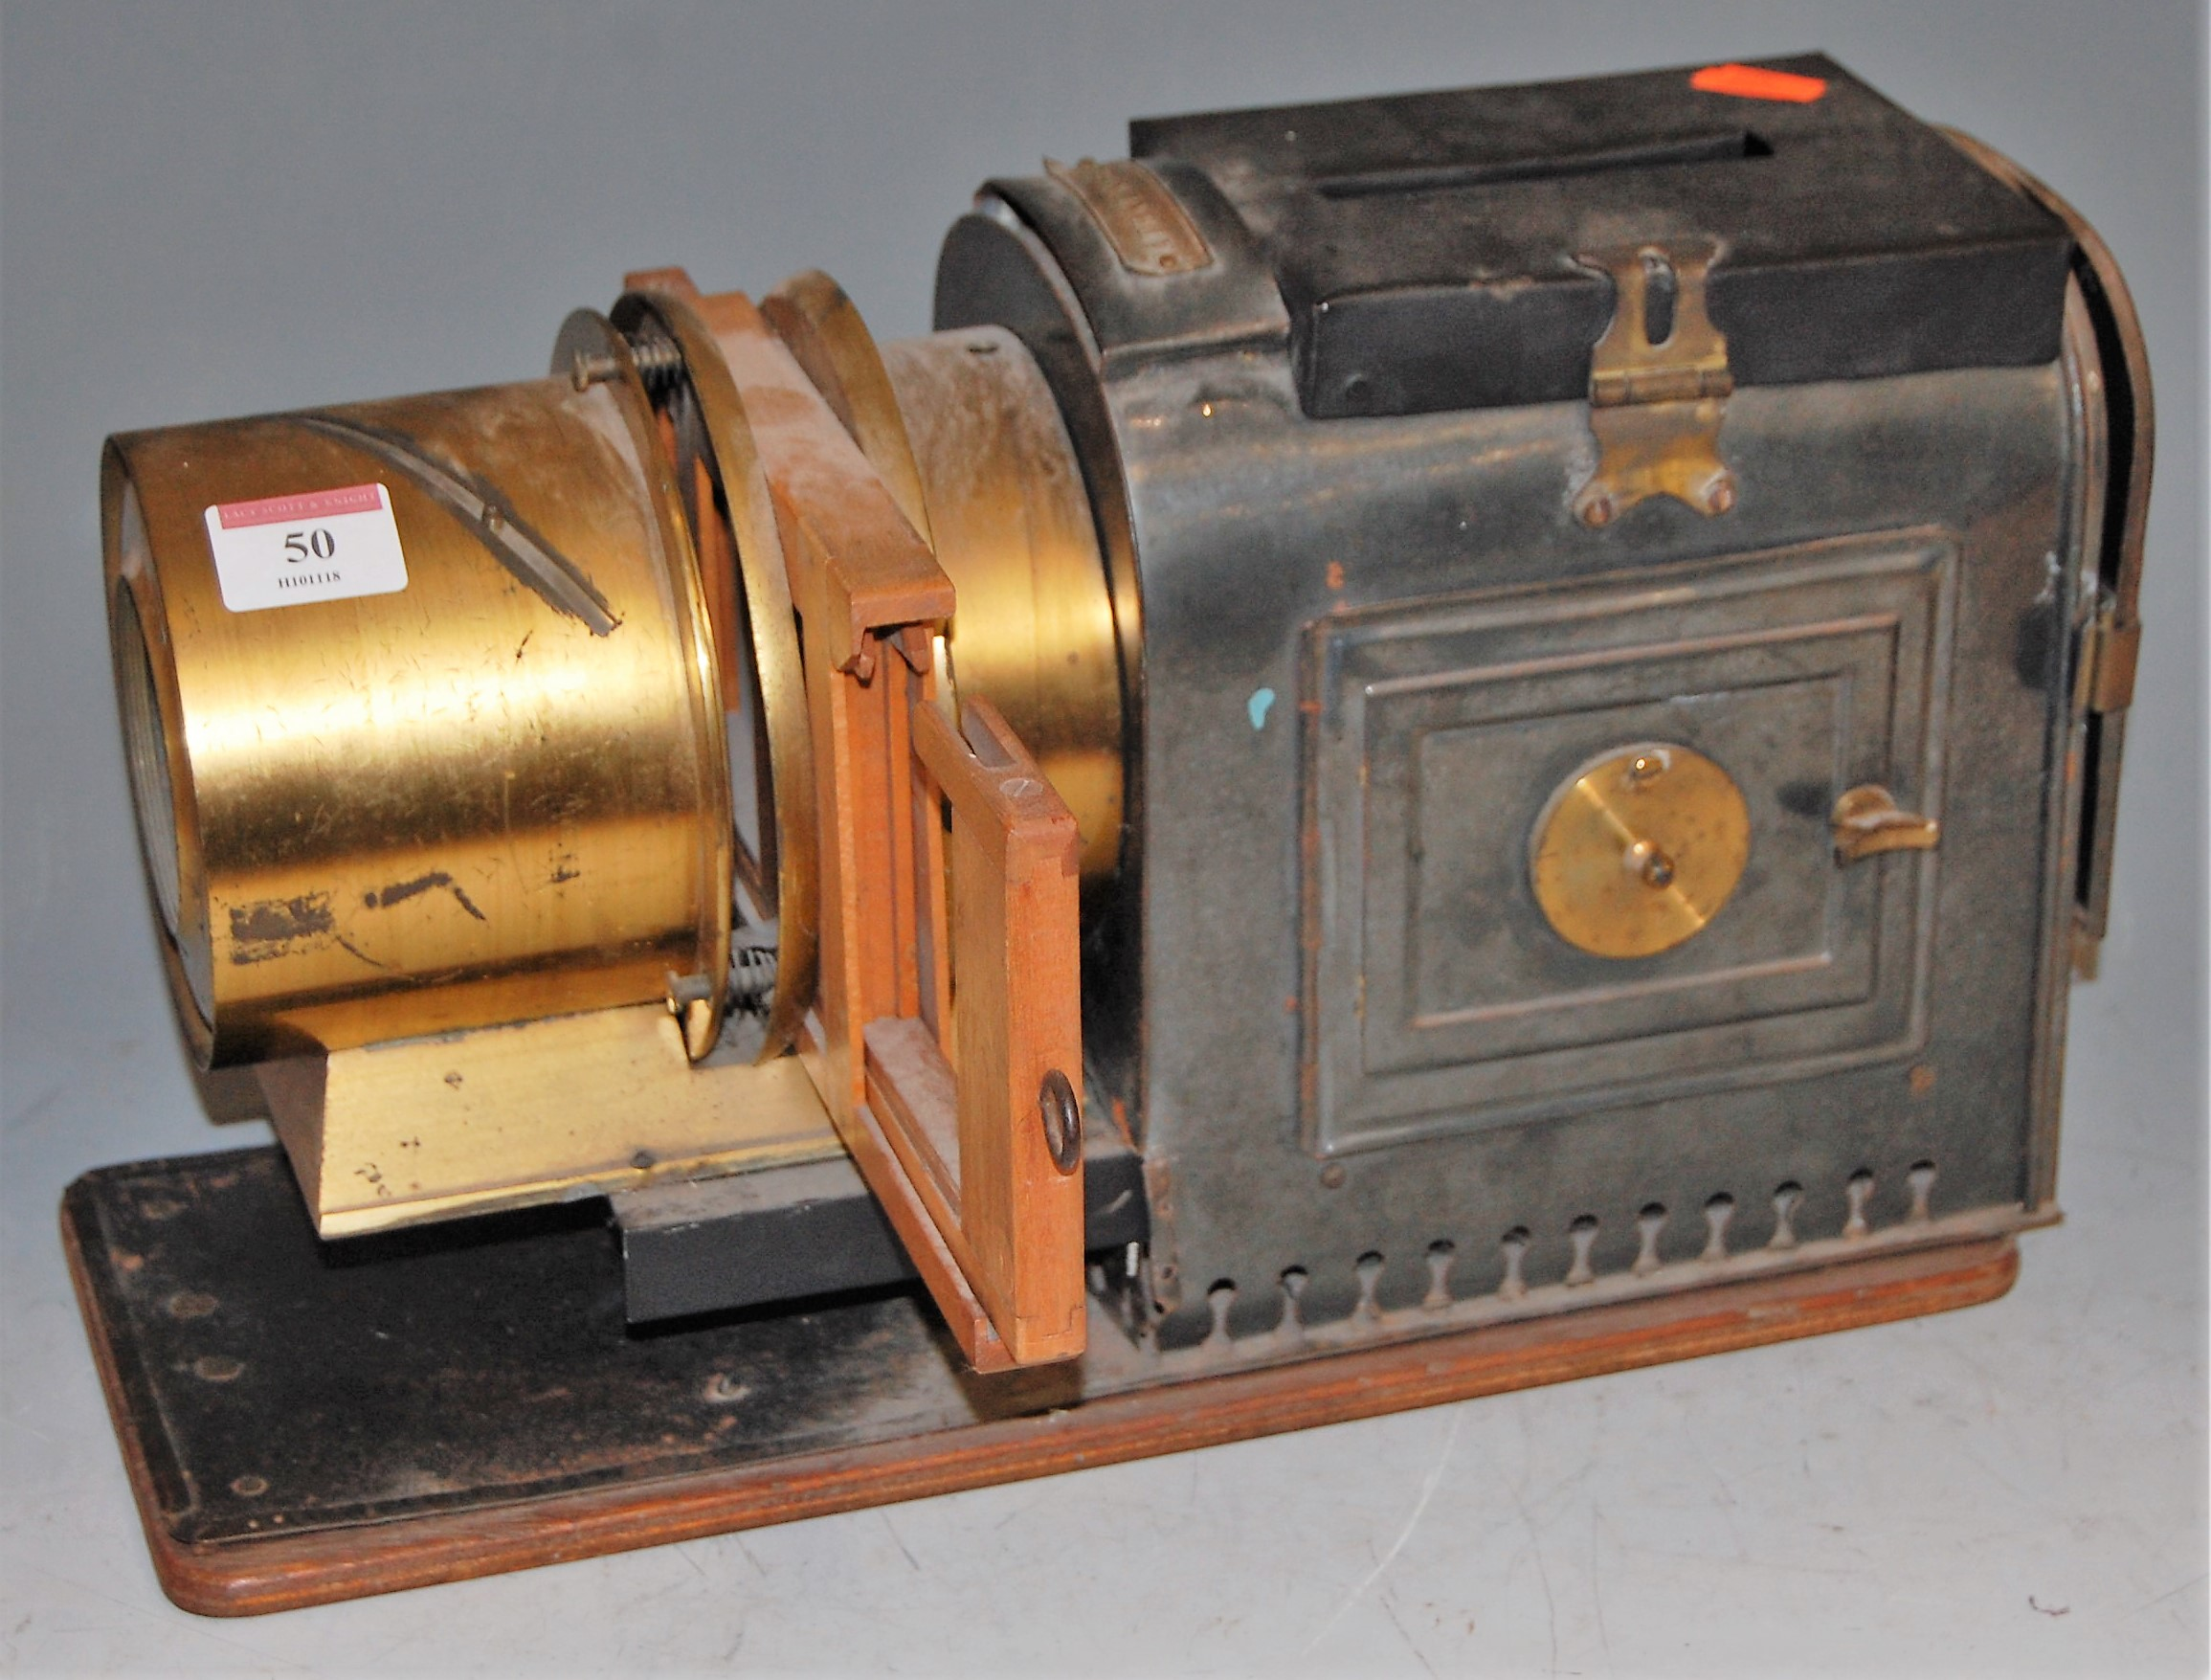 Lot 50 - An early 20th century magic lantern, bearing plaque patent No.245